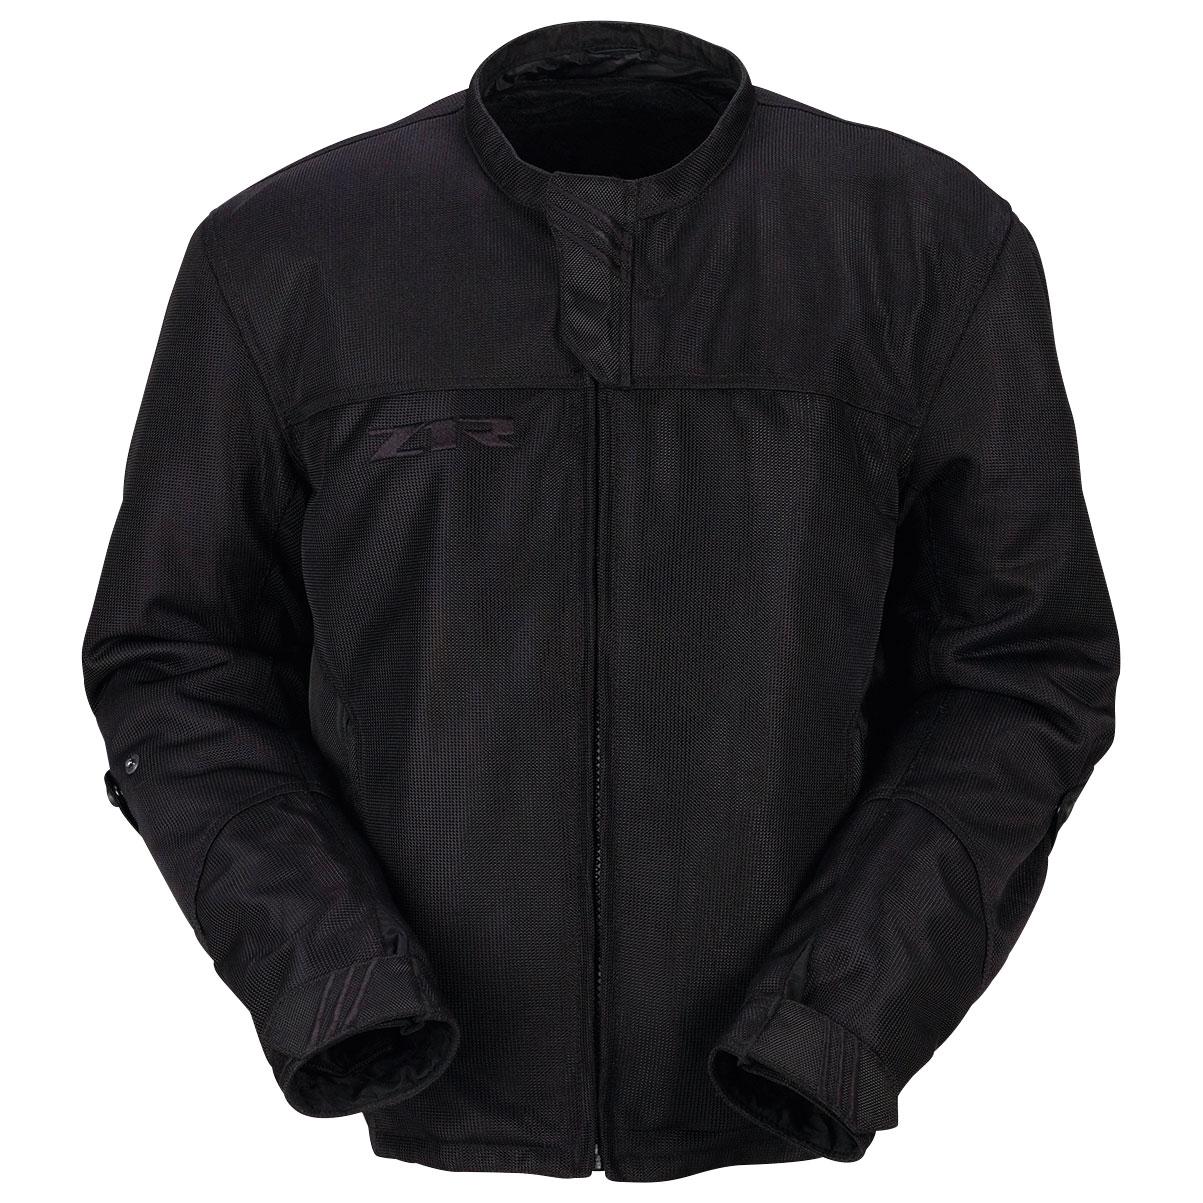 Z1R Men's Gust Mesh Black Jacket